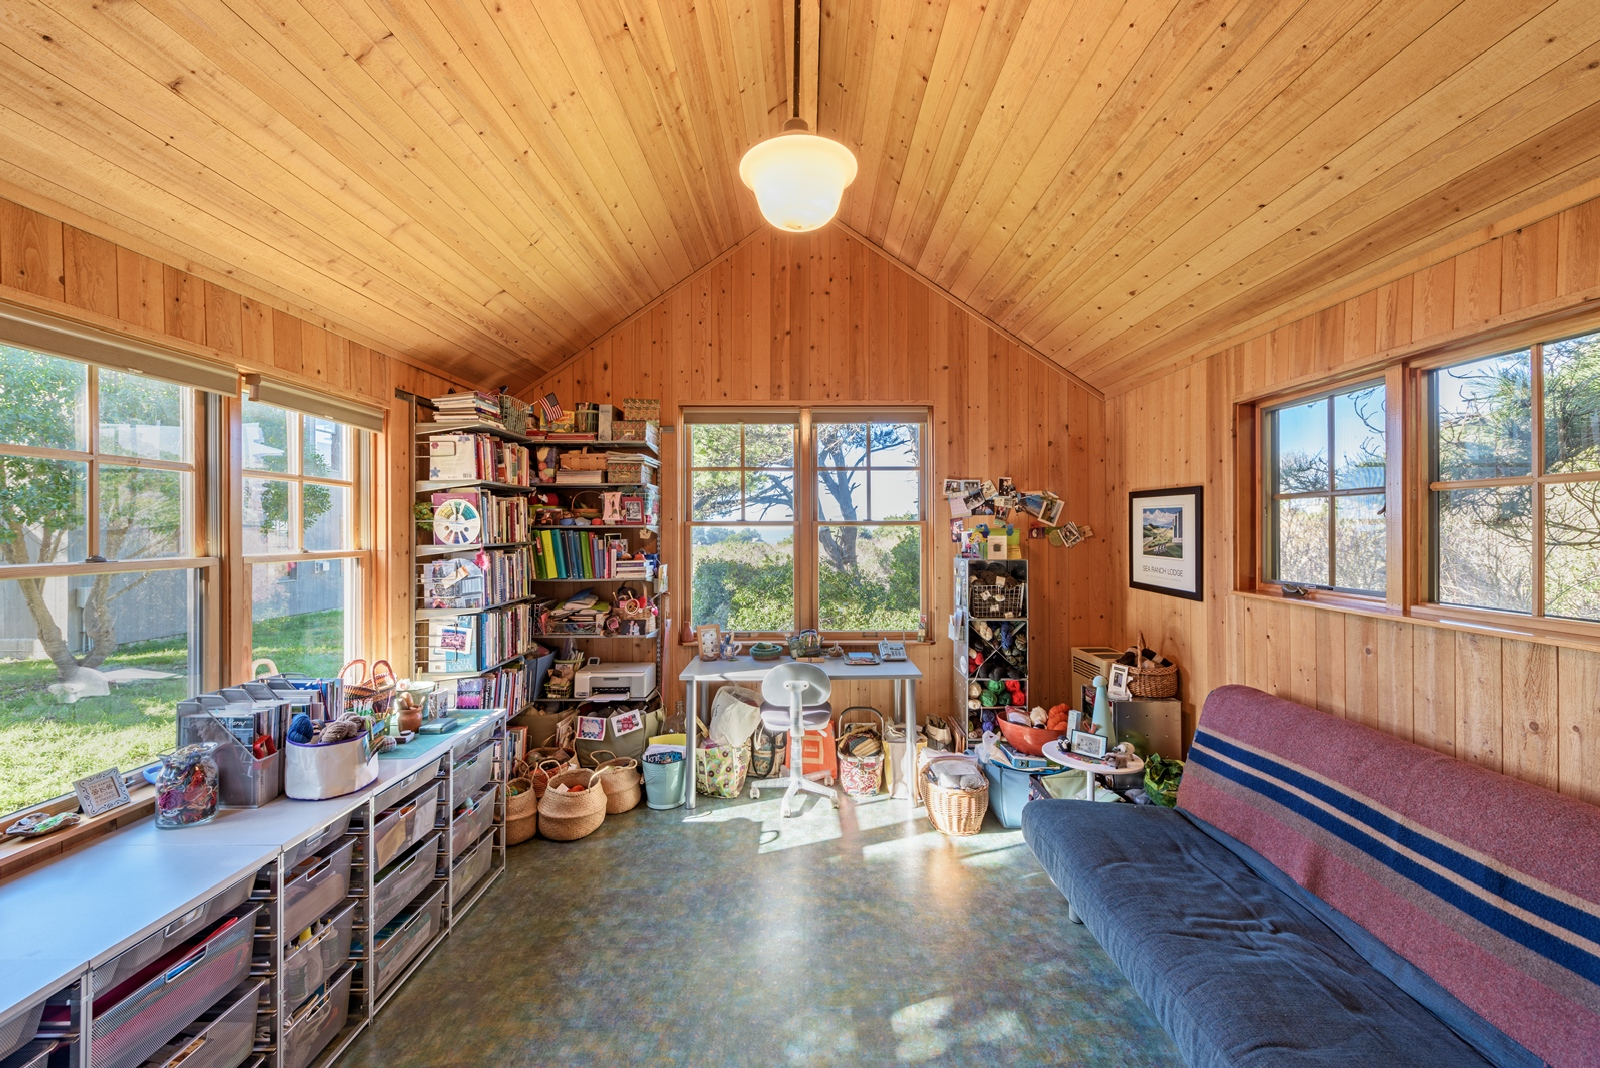 The Knitting Studio